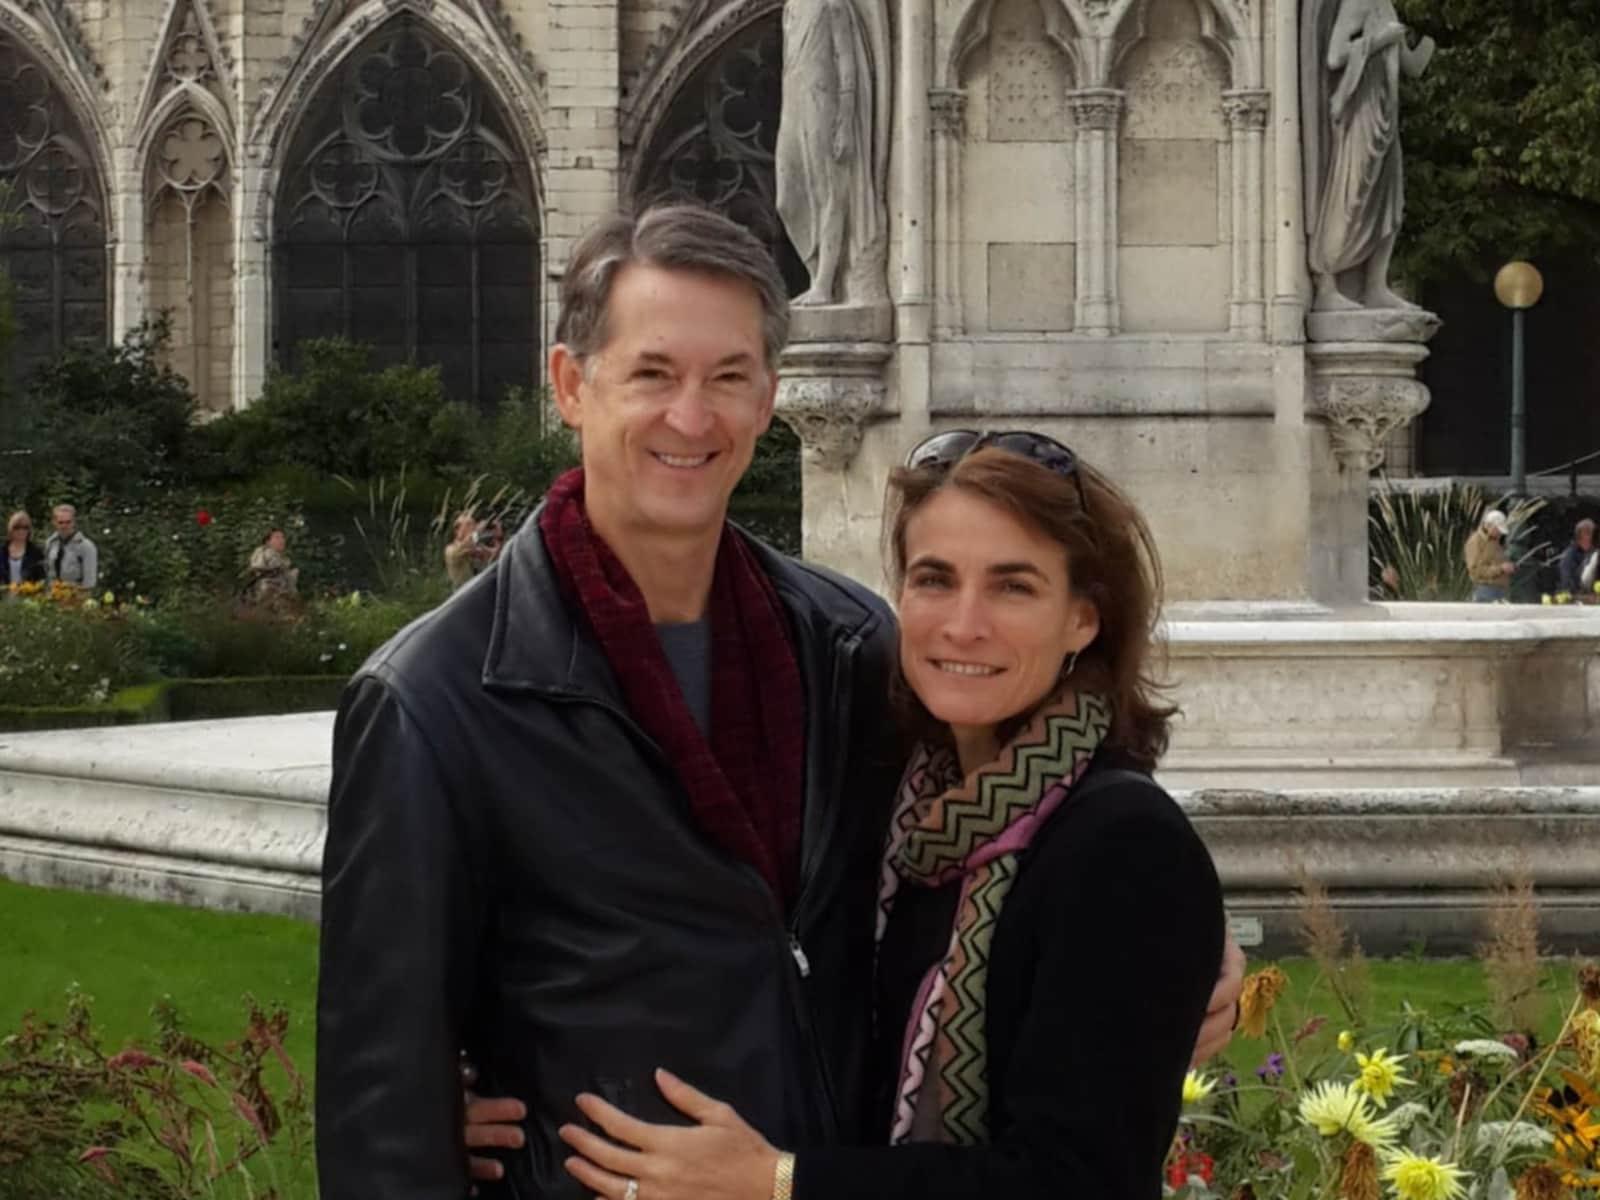 Tamara & David from Dallas, Texas, United States